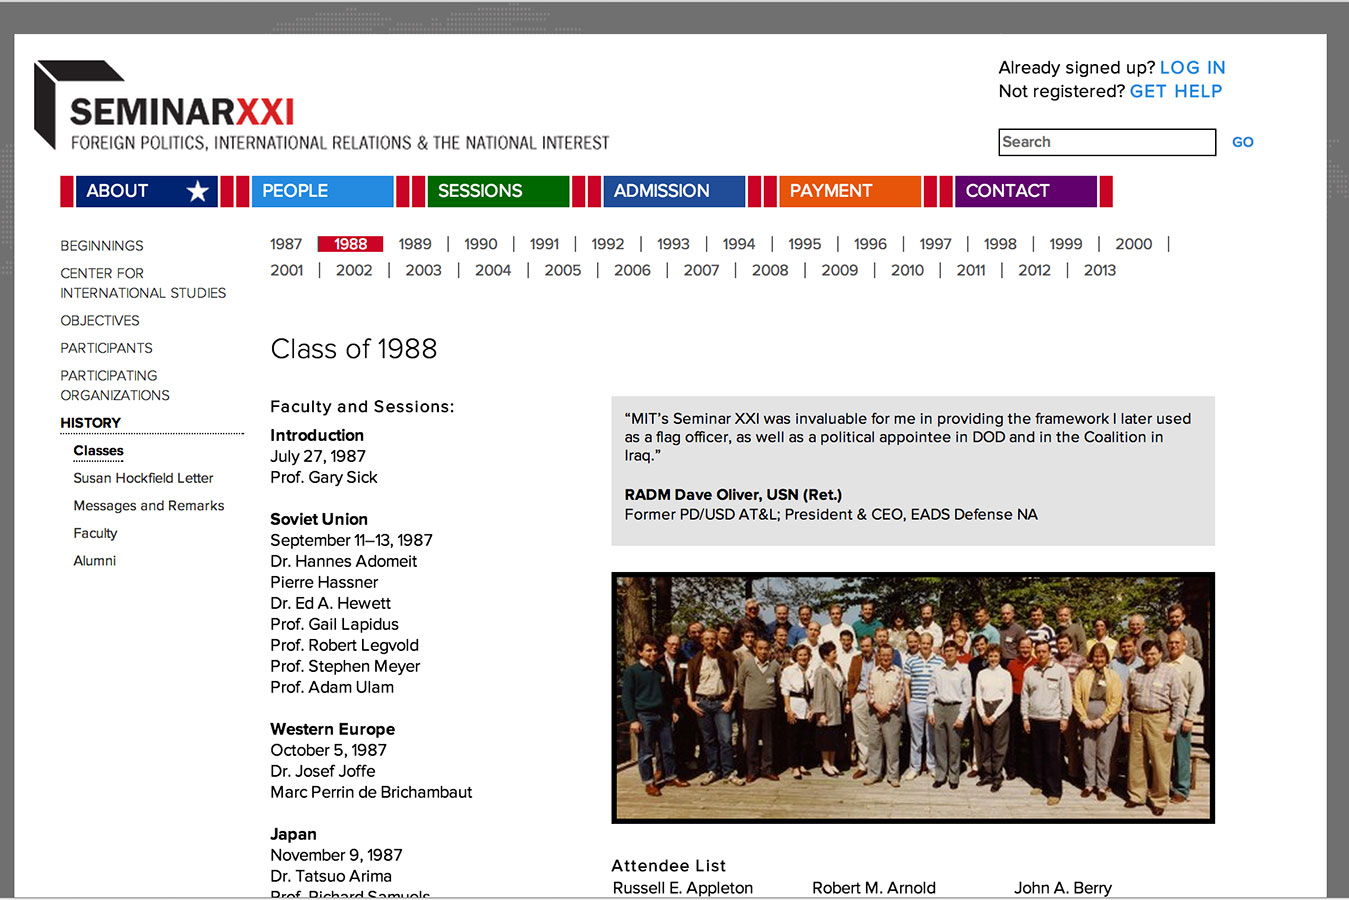 Seminar XXI history